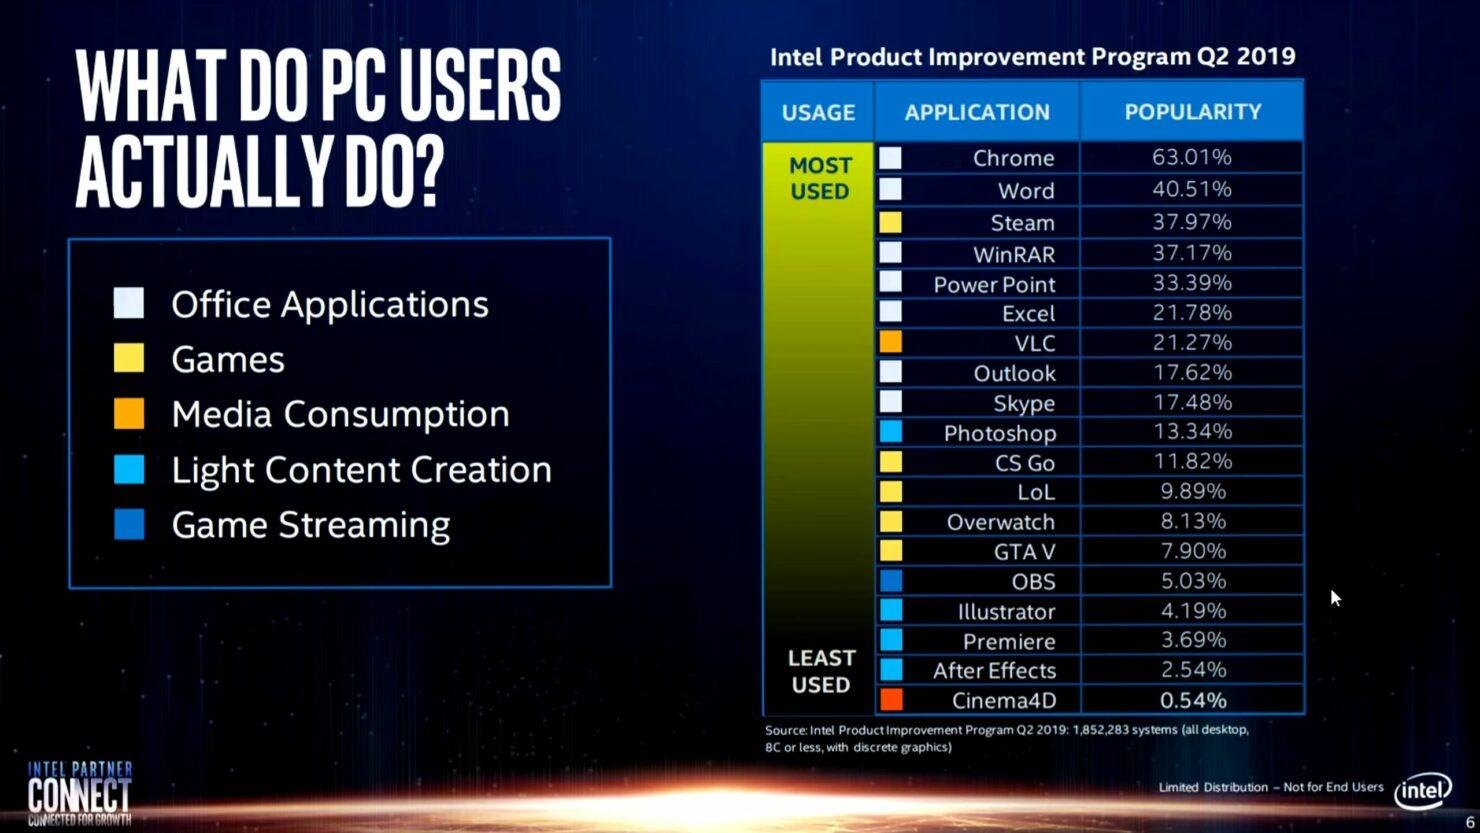 intel-real-world-performance-benchmarks_amd-ryzen-4000_amd-ryzen-3000_intel-10th-gen_intel-9th-gen-cpus_4-2